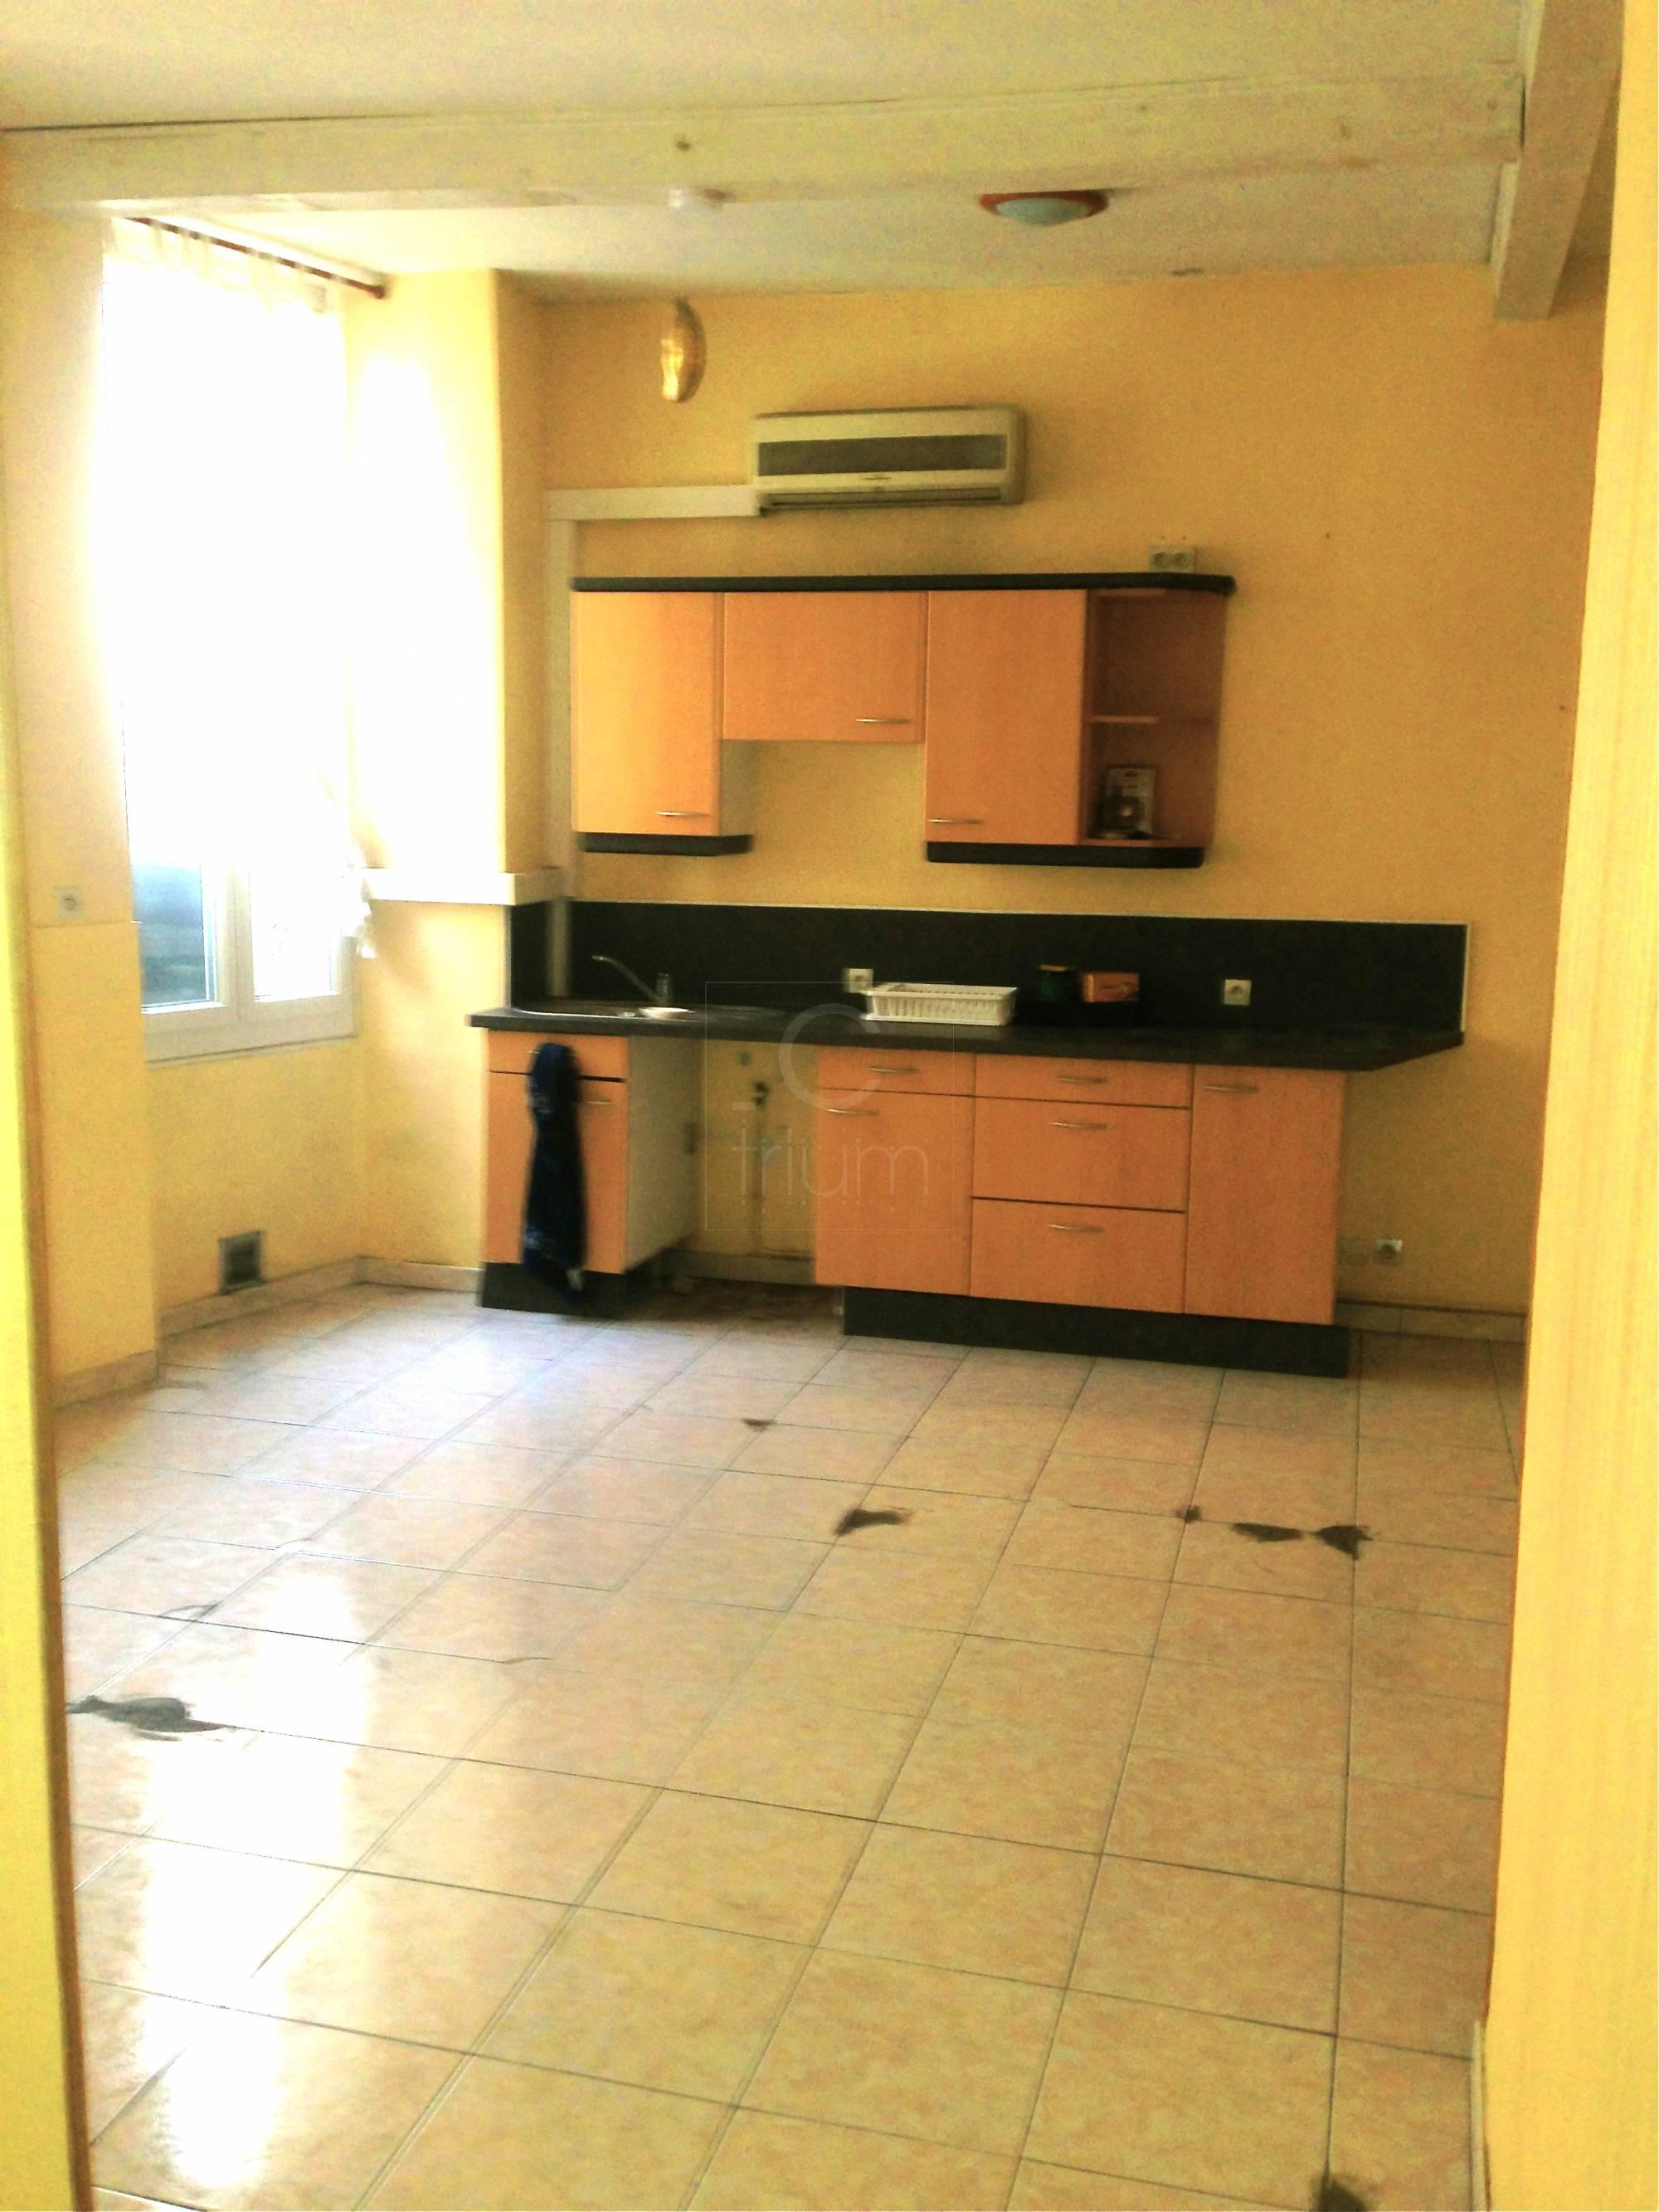 vente appartement t2 f2 marseille 7eme endoume st lambert agence immobili re marseille 7 me. Black Bedroom Furniture Sets. Home Design Ideas